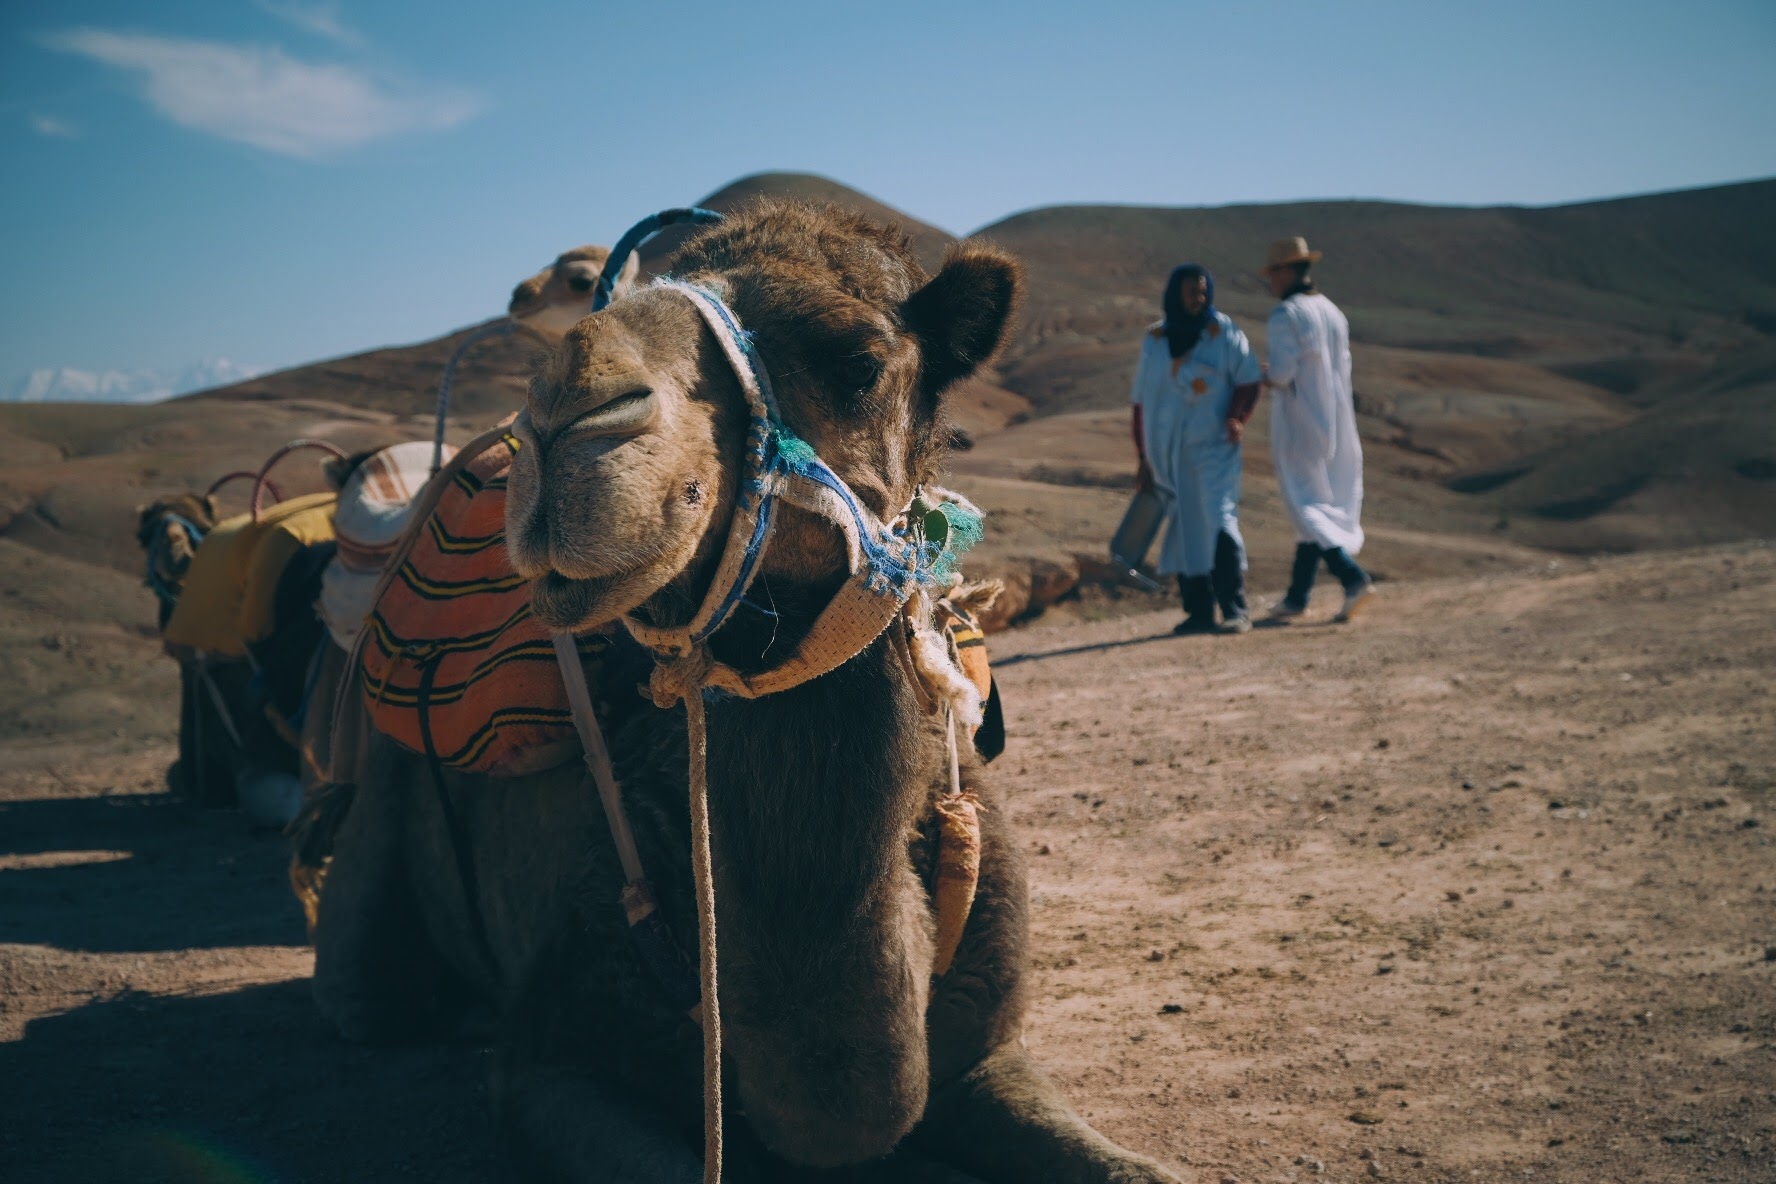 fatima – queen of the desert, sahara